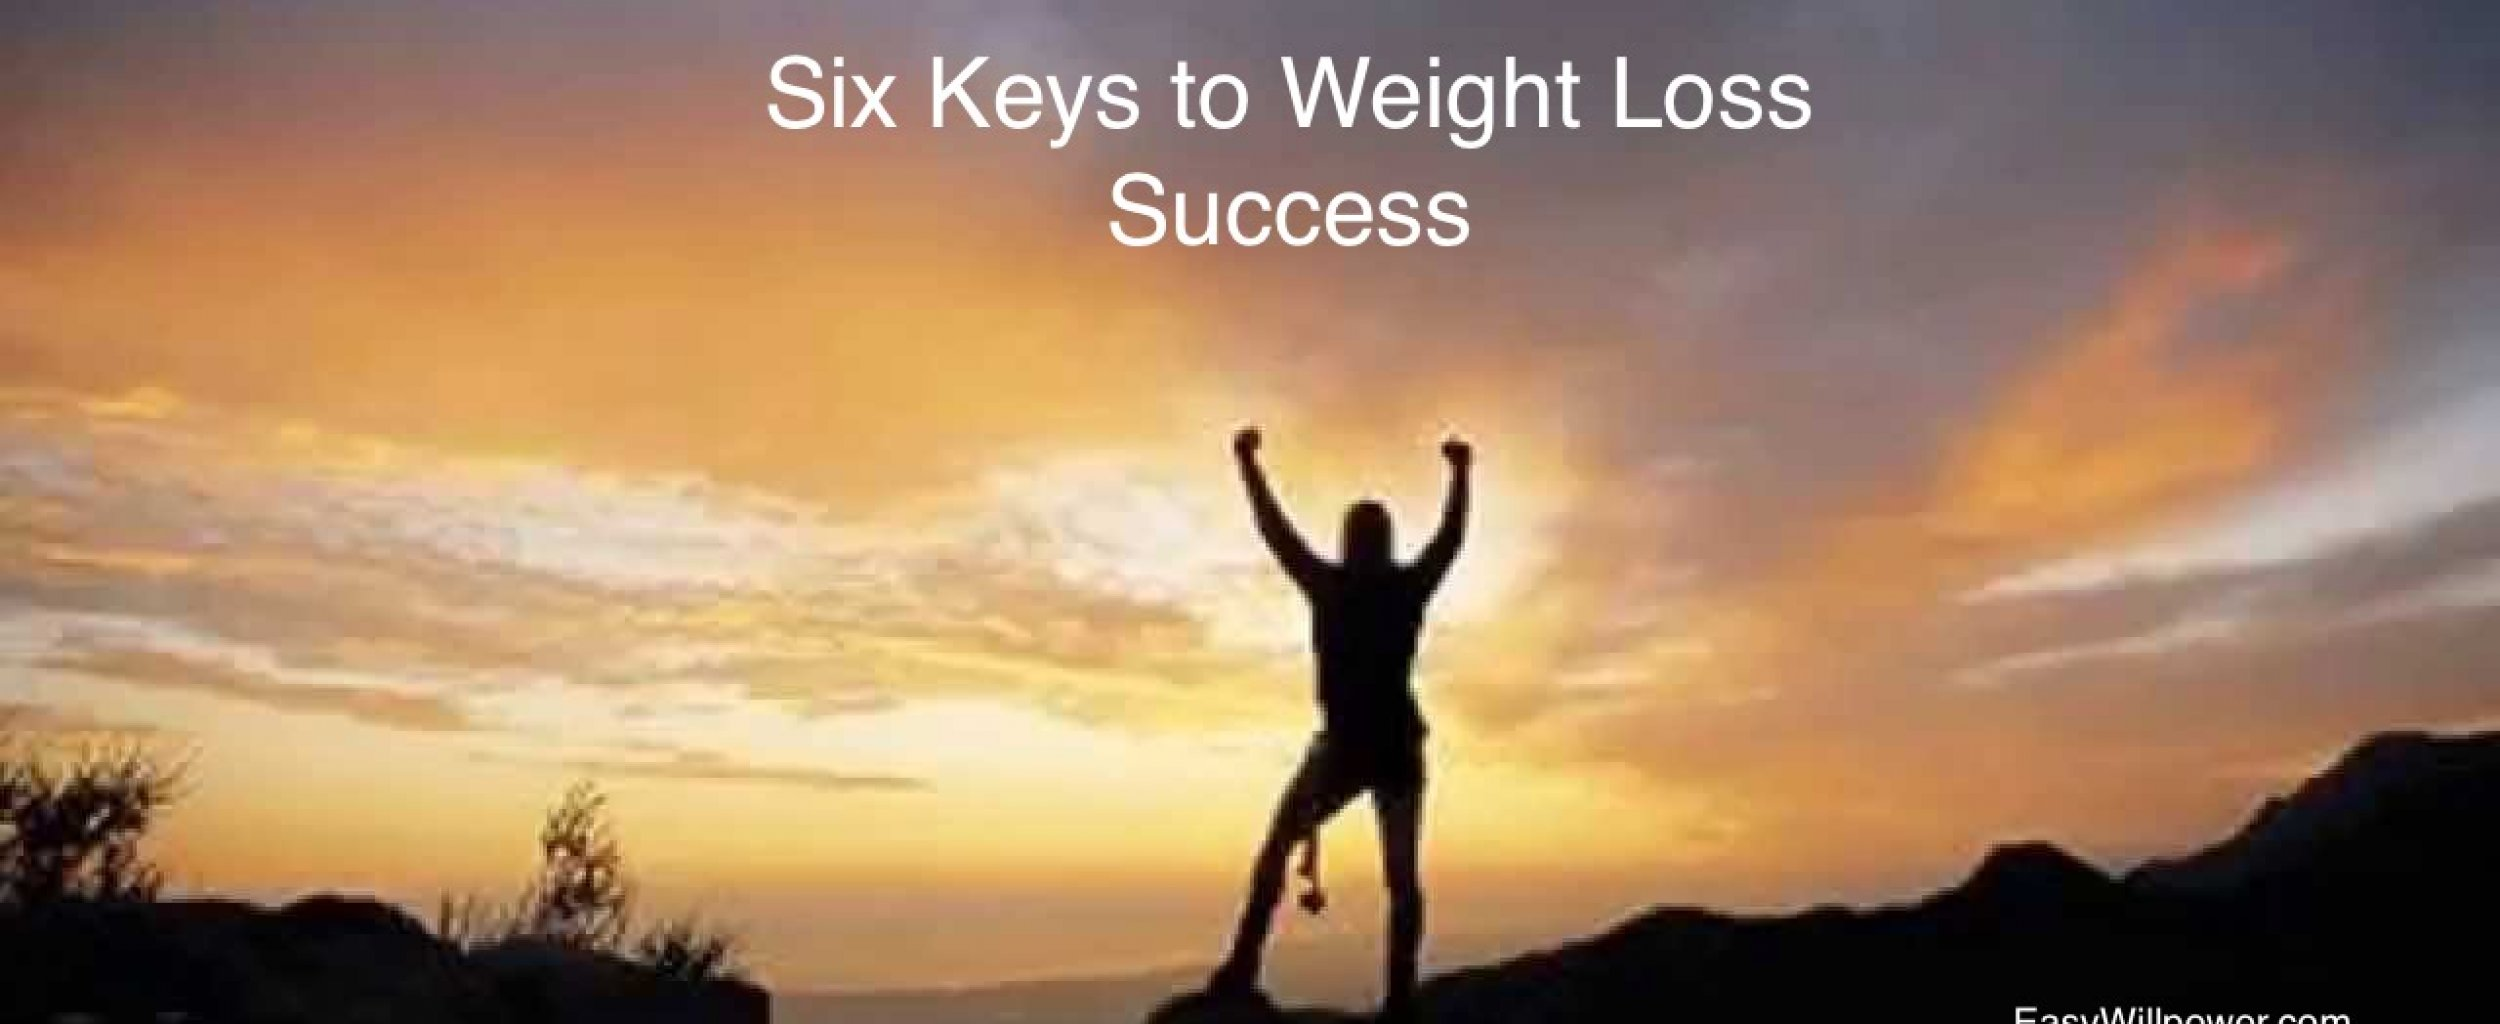 Six Keys to Weight Loss Success